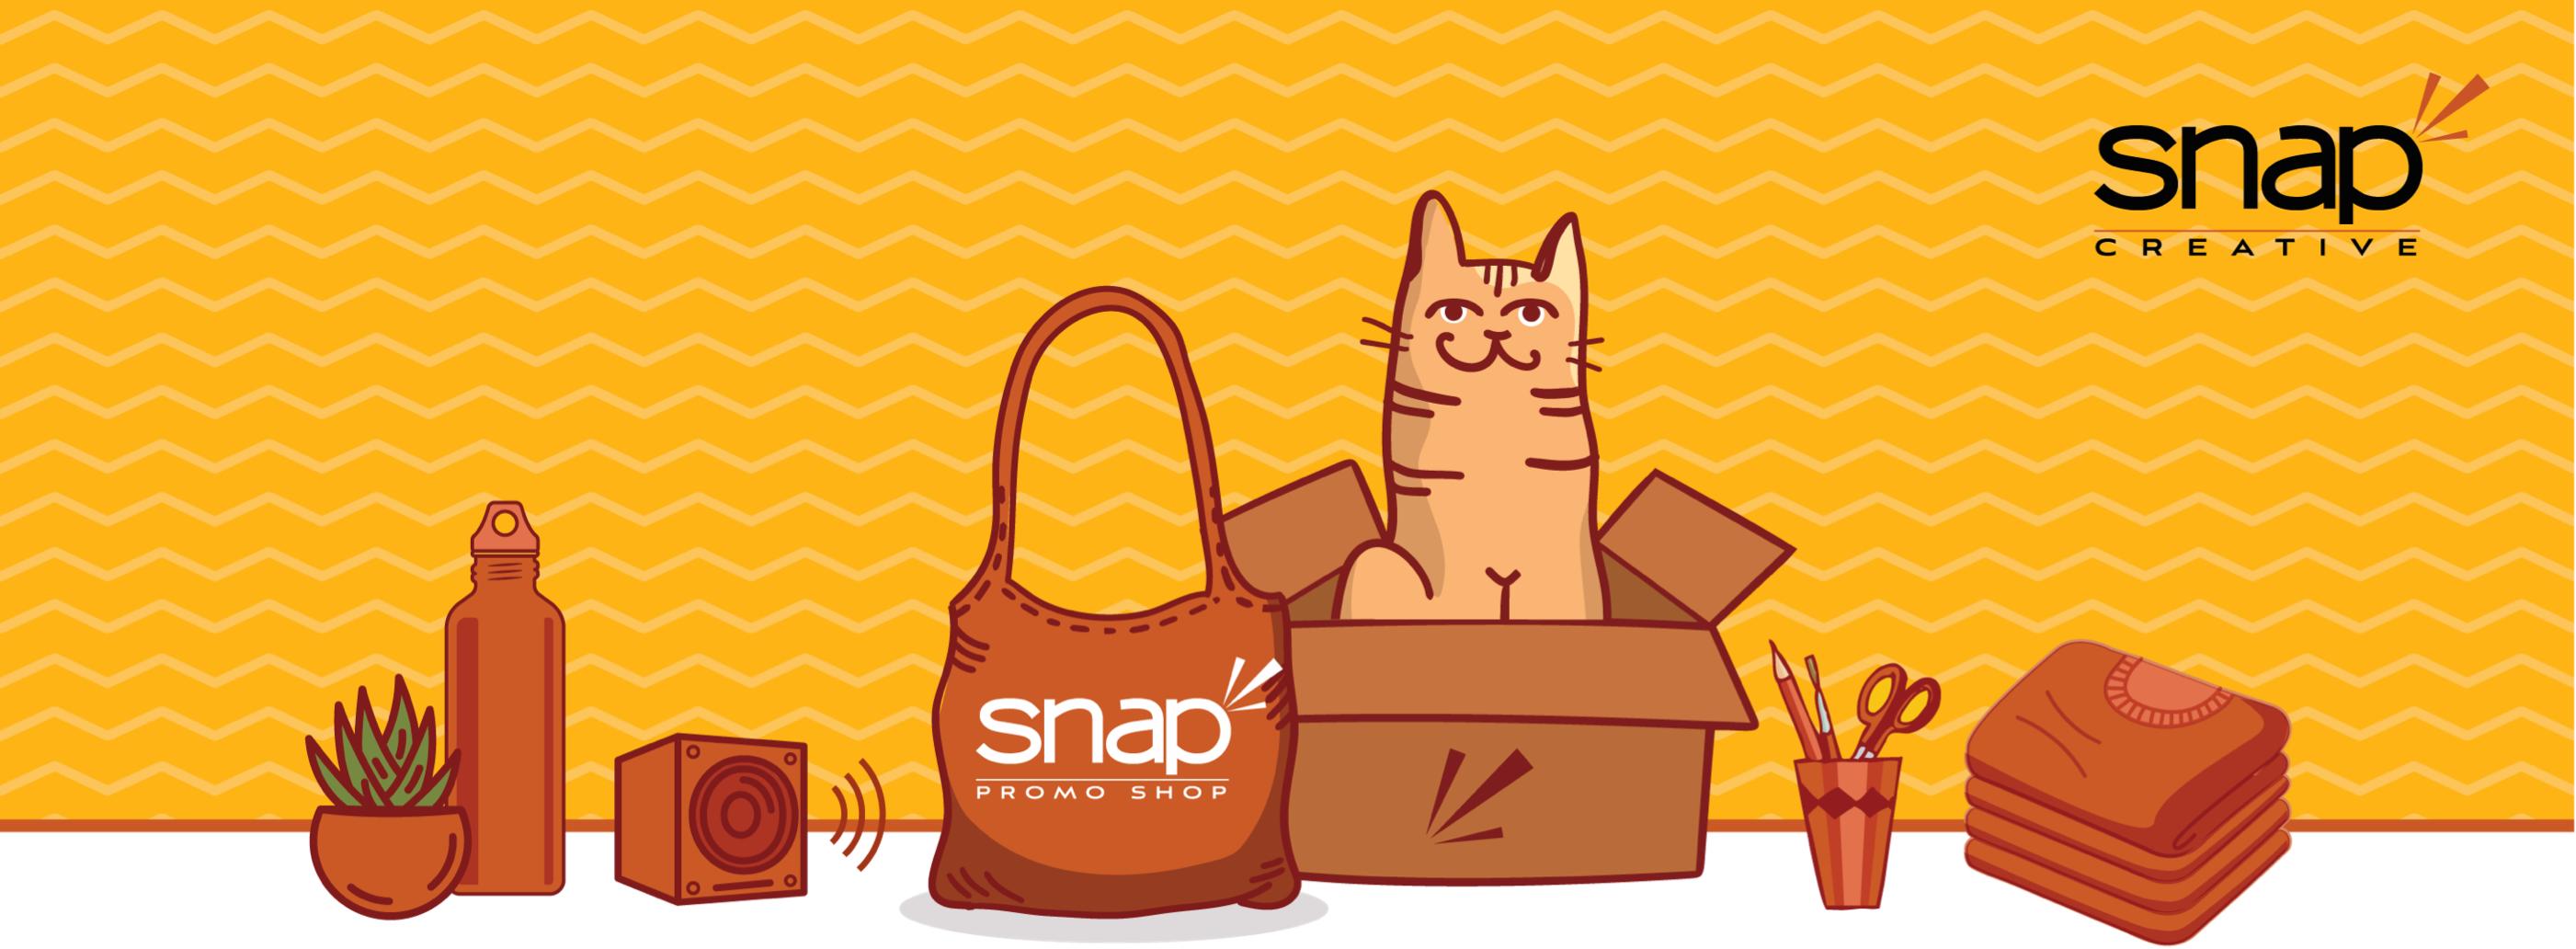 Snap Promo Shop